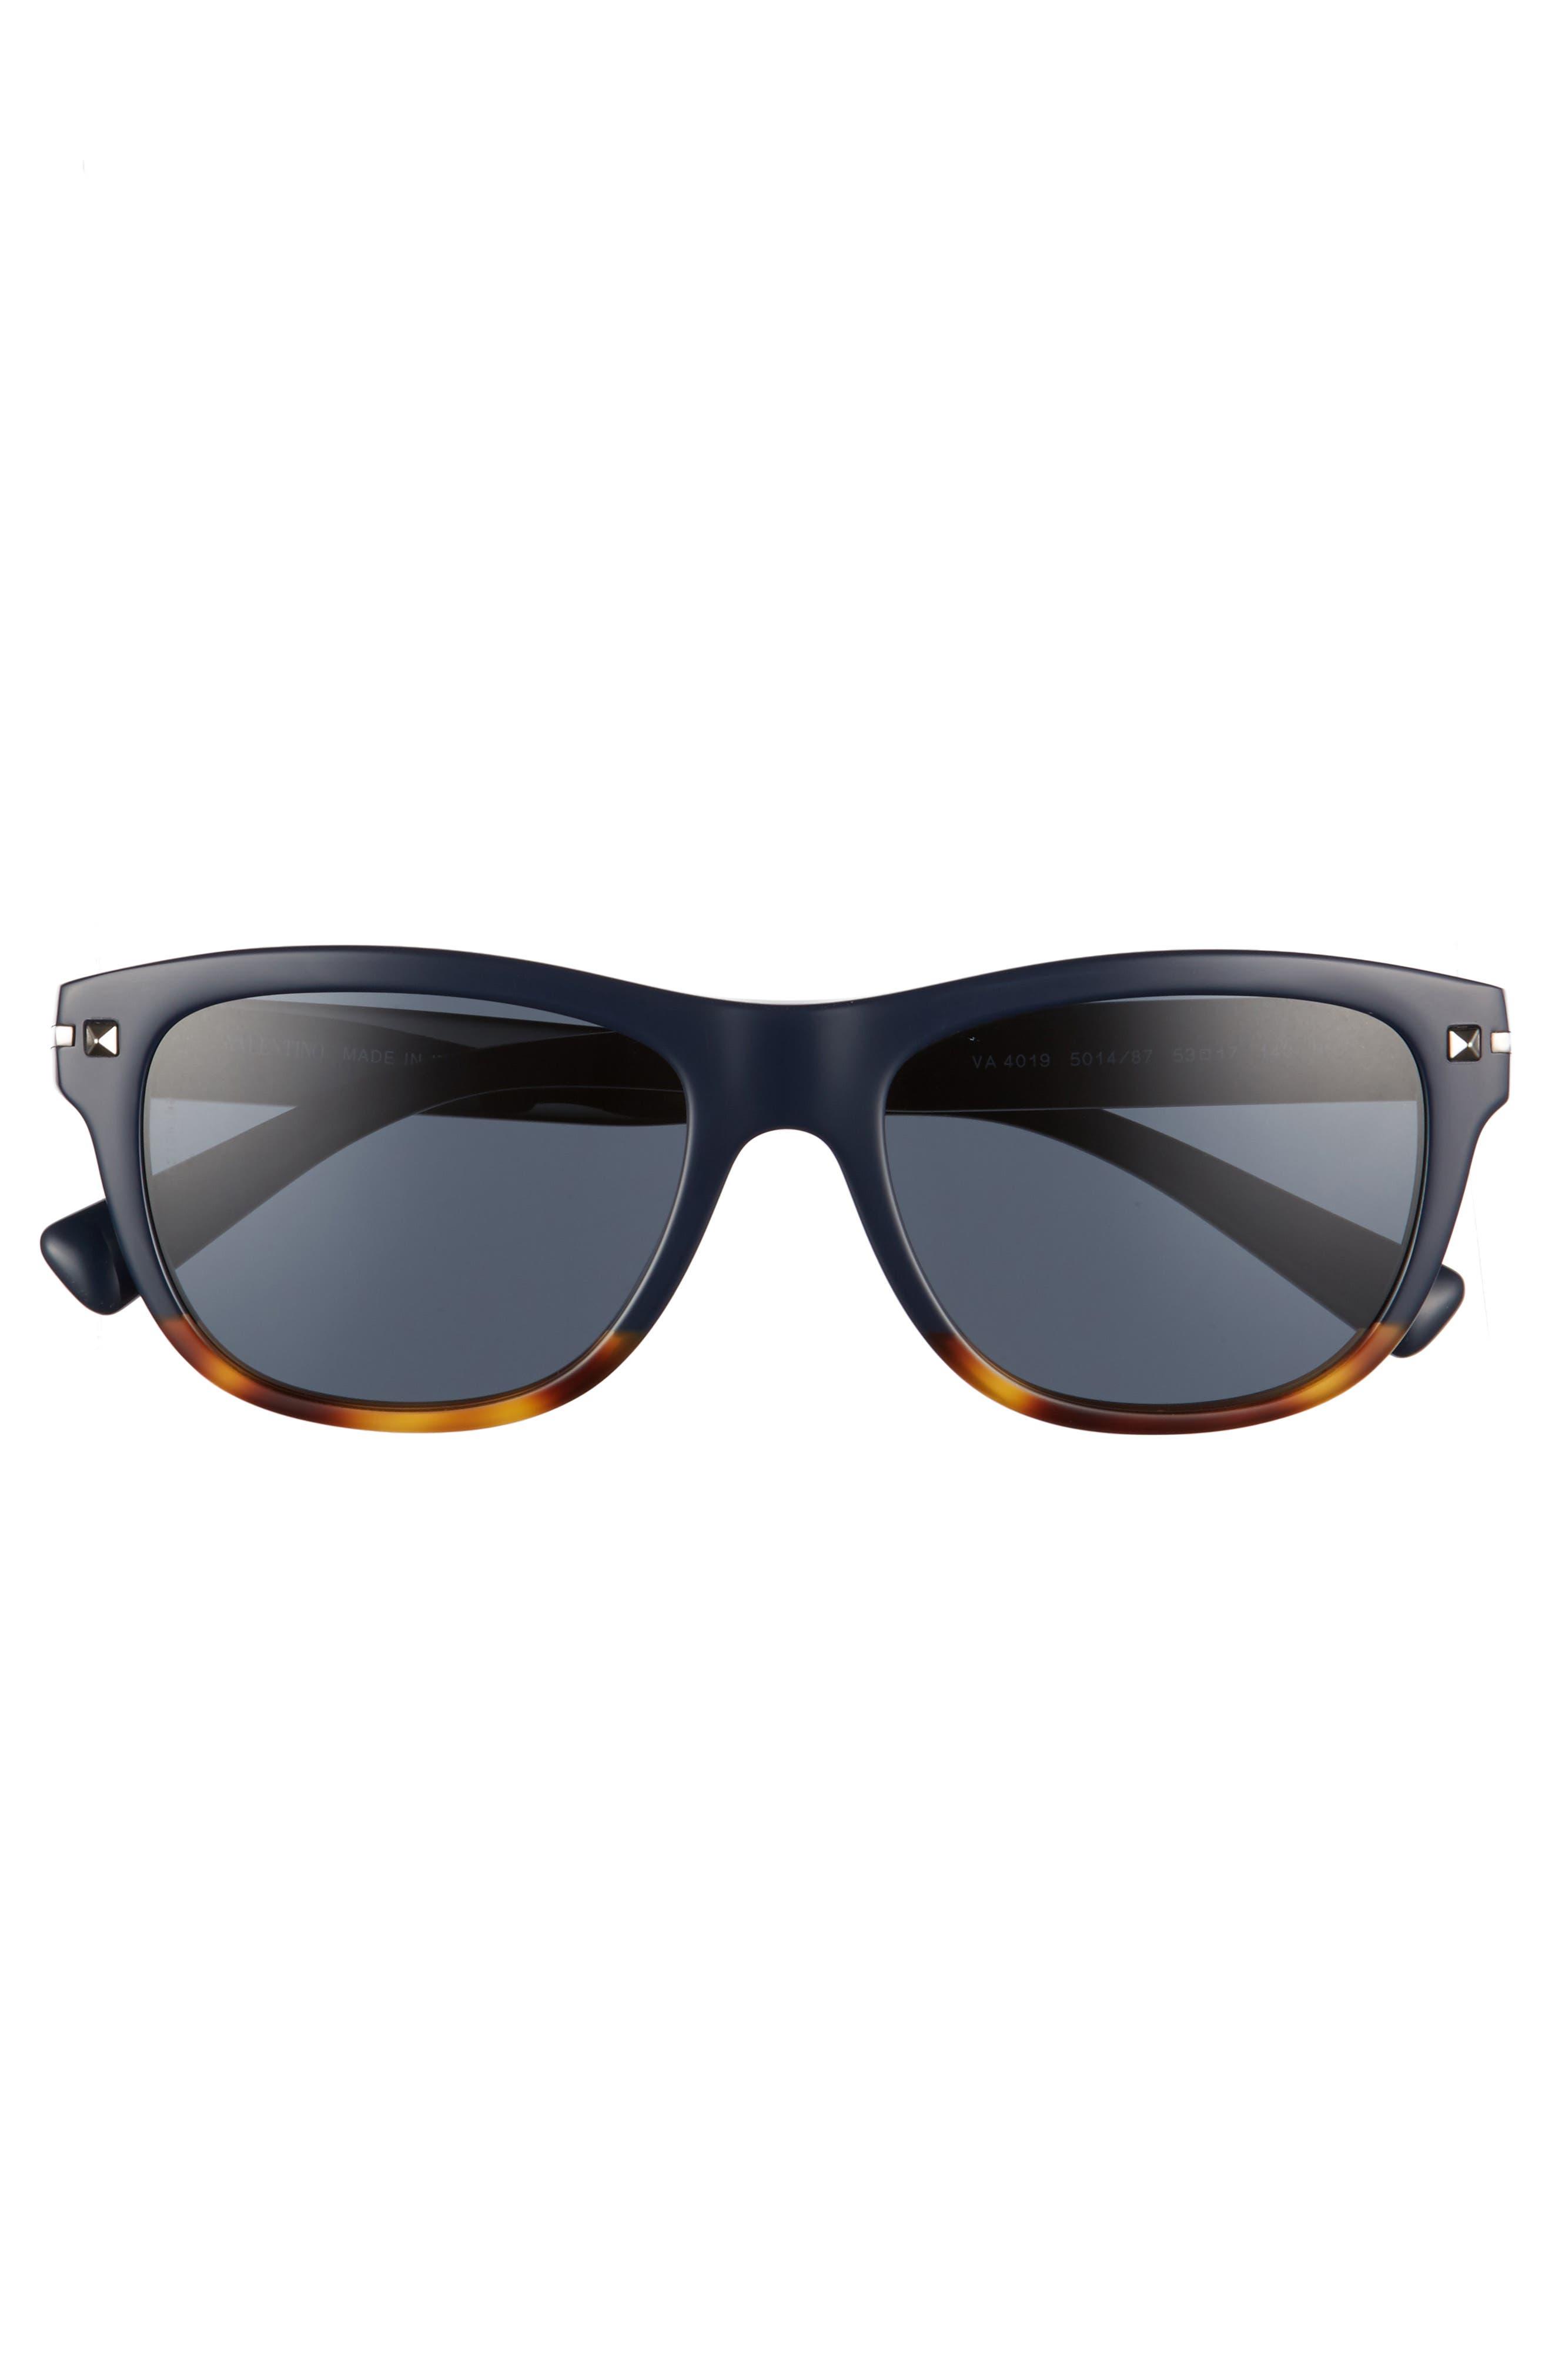 53mm Rectangle Sunglasses,                             Alternate thumbnail 3, color,                             Blue/ Havana